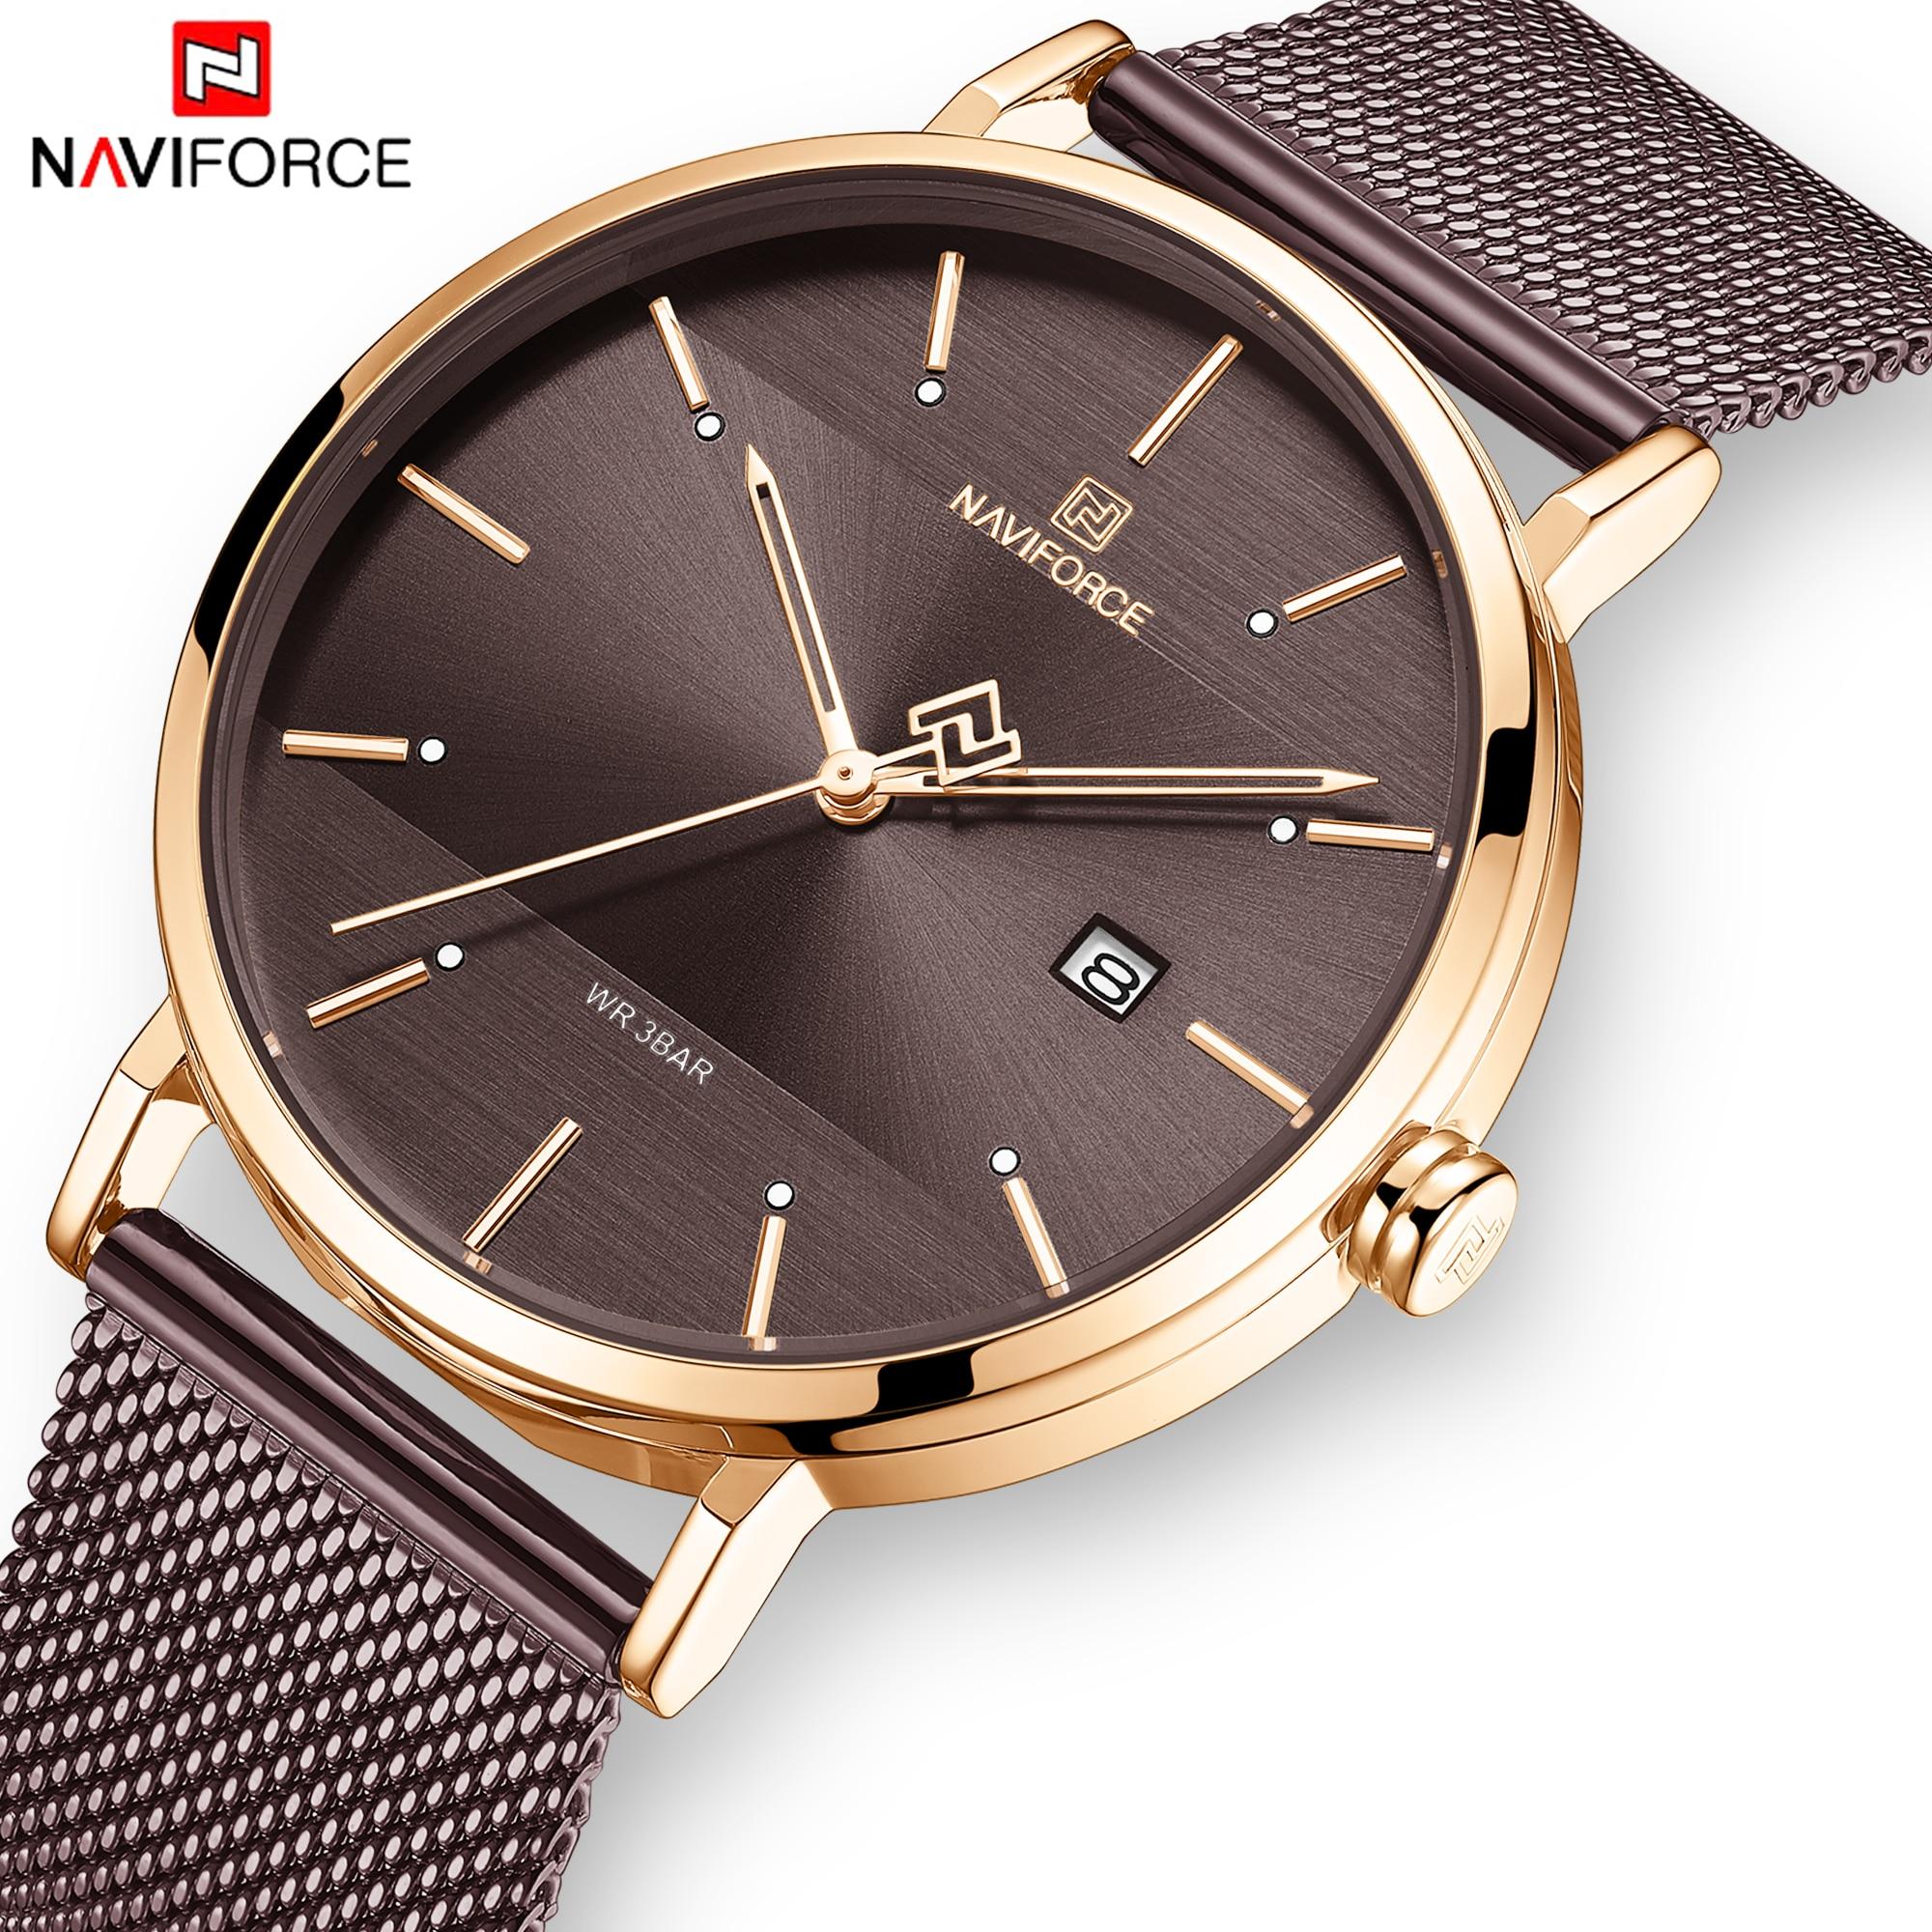 NAVIFORCE Lover's Watches For Men And Women Fashion Simple Quartz Wristwatch Waterproof Date Clock Luxury Couple Watch Gift 2019